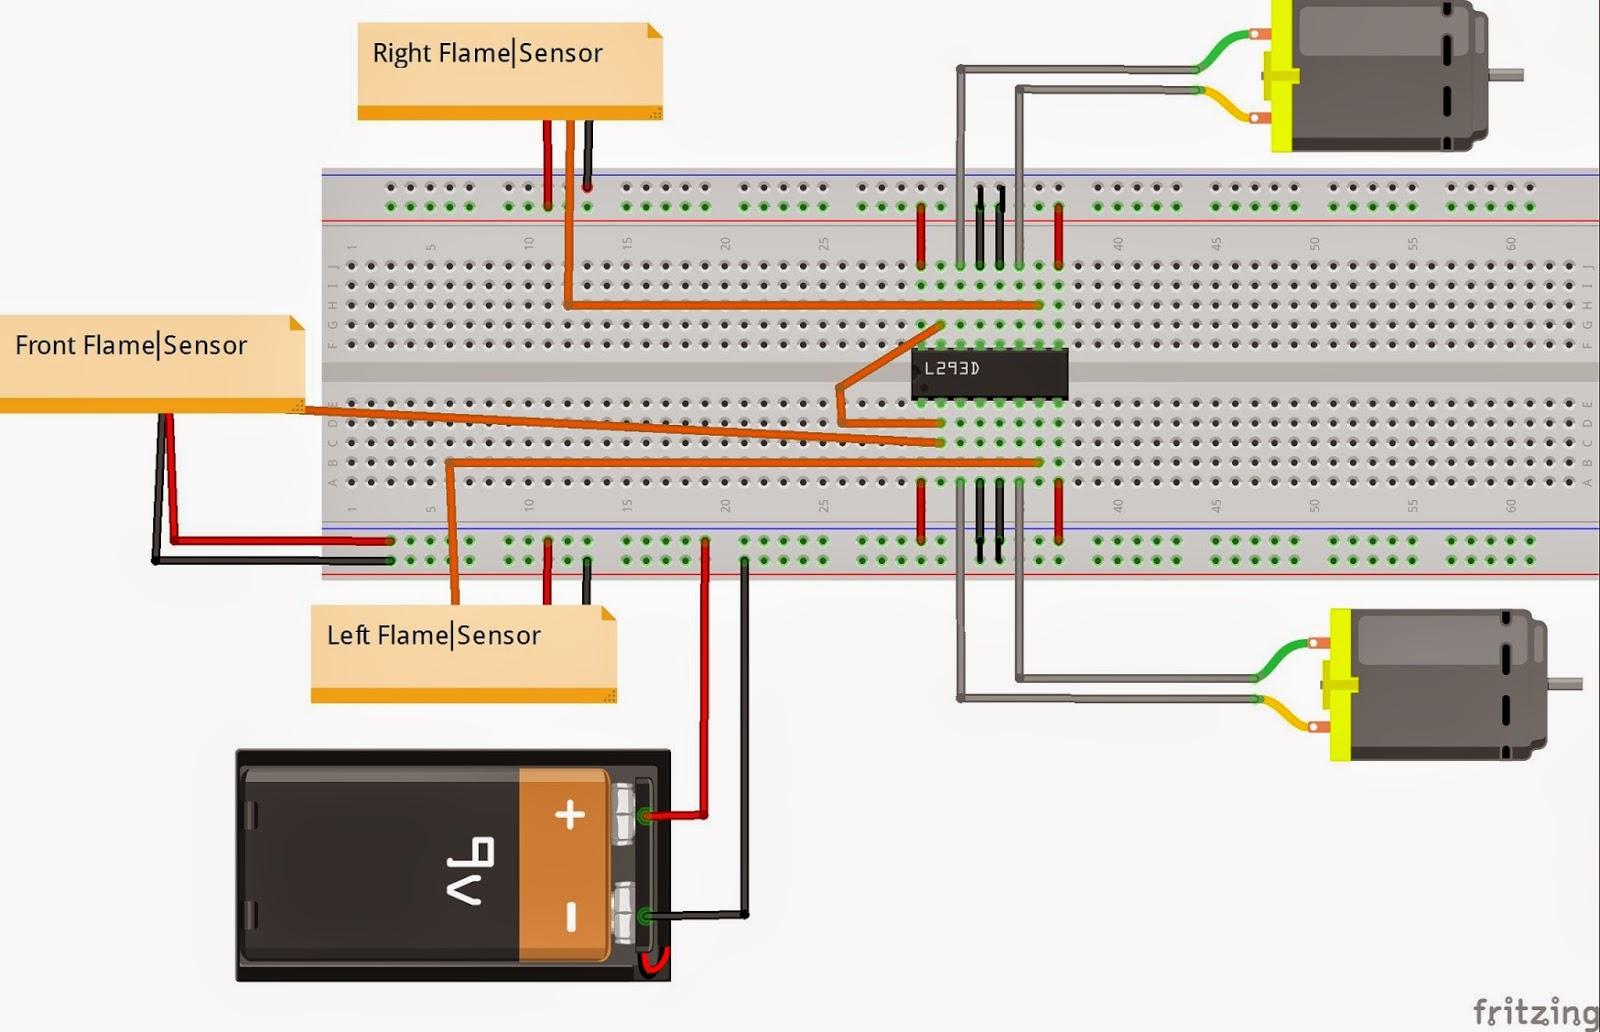 L293d Motor Driver Circuit Diagram Sony Xplod 52wx4 Stereo Wiring Pin Of Impremedia